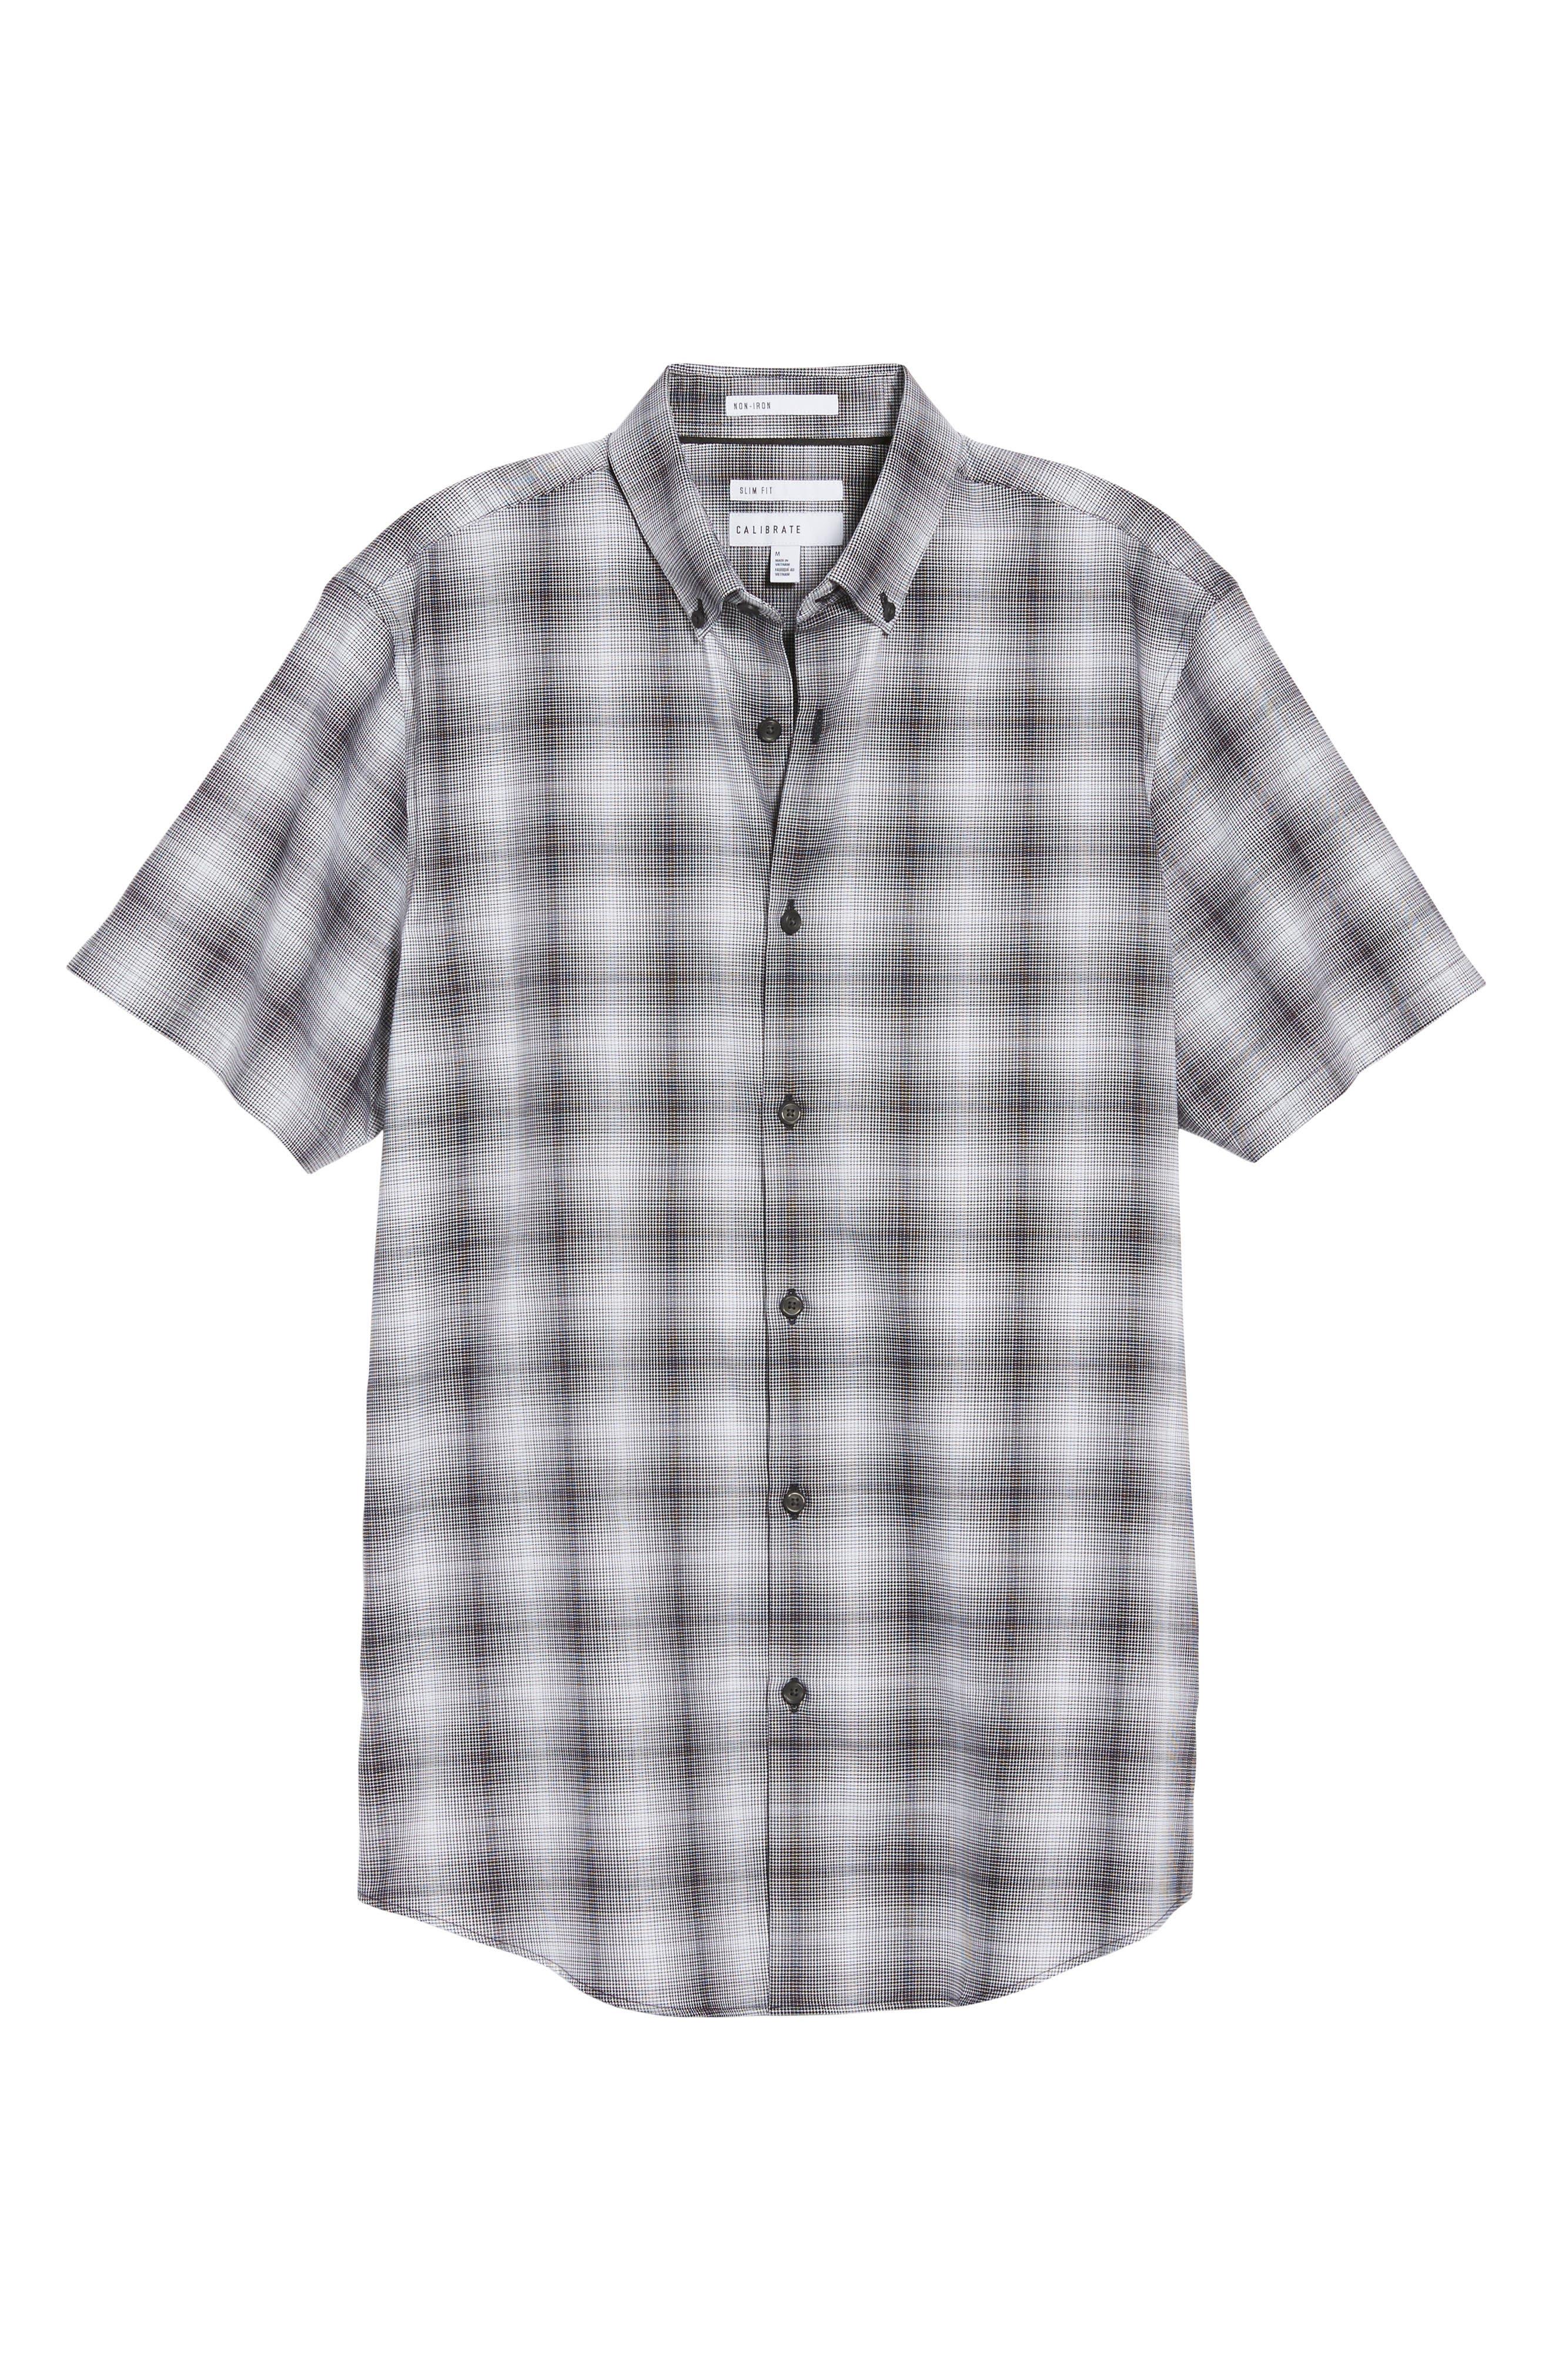 Non-Iron Moiré Plaid Woven Shirt,                             Alternate thumbnail 5, color,                             Black Houndstooth Plaid